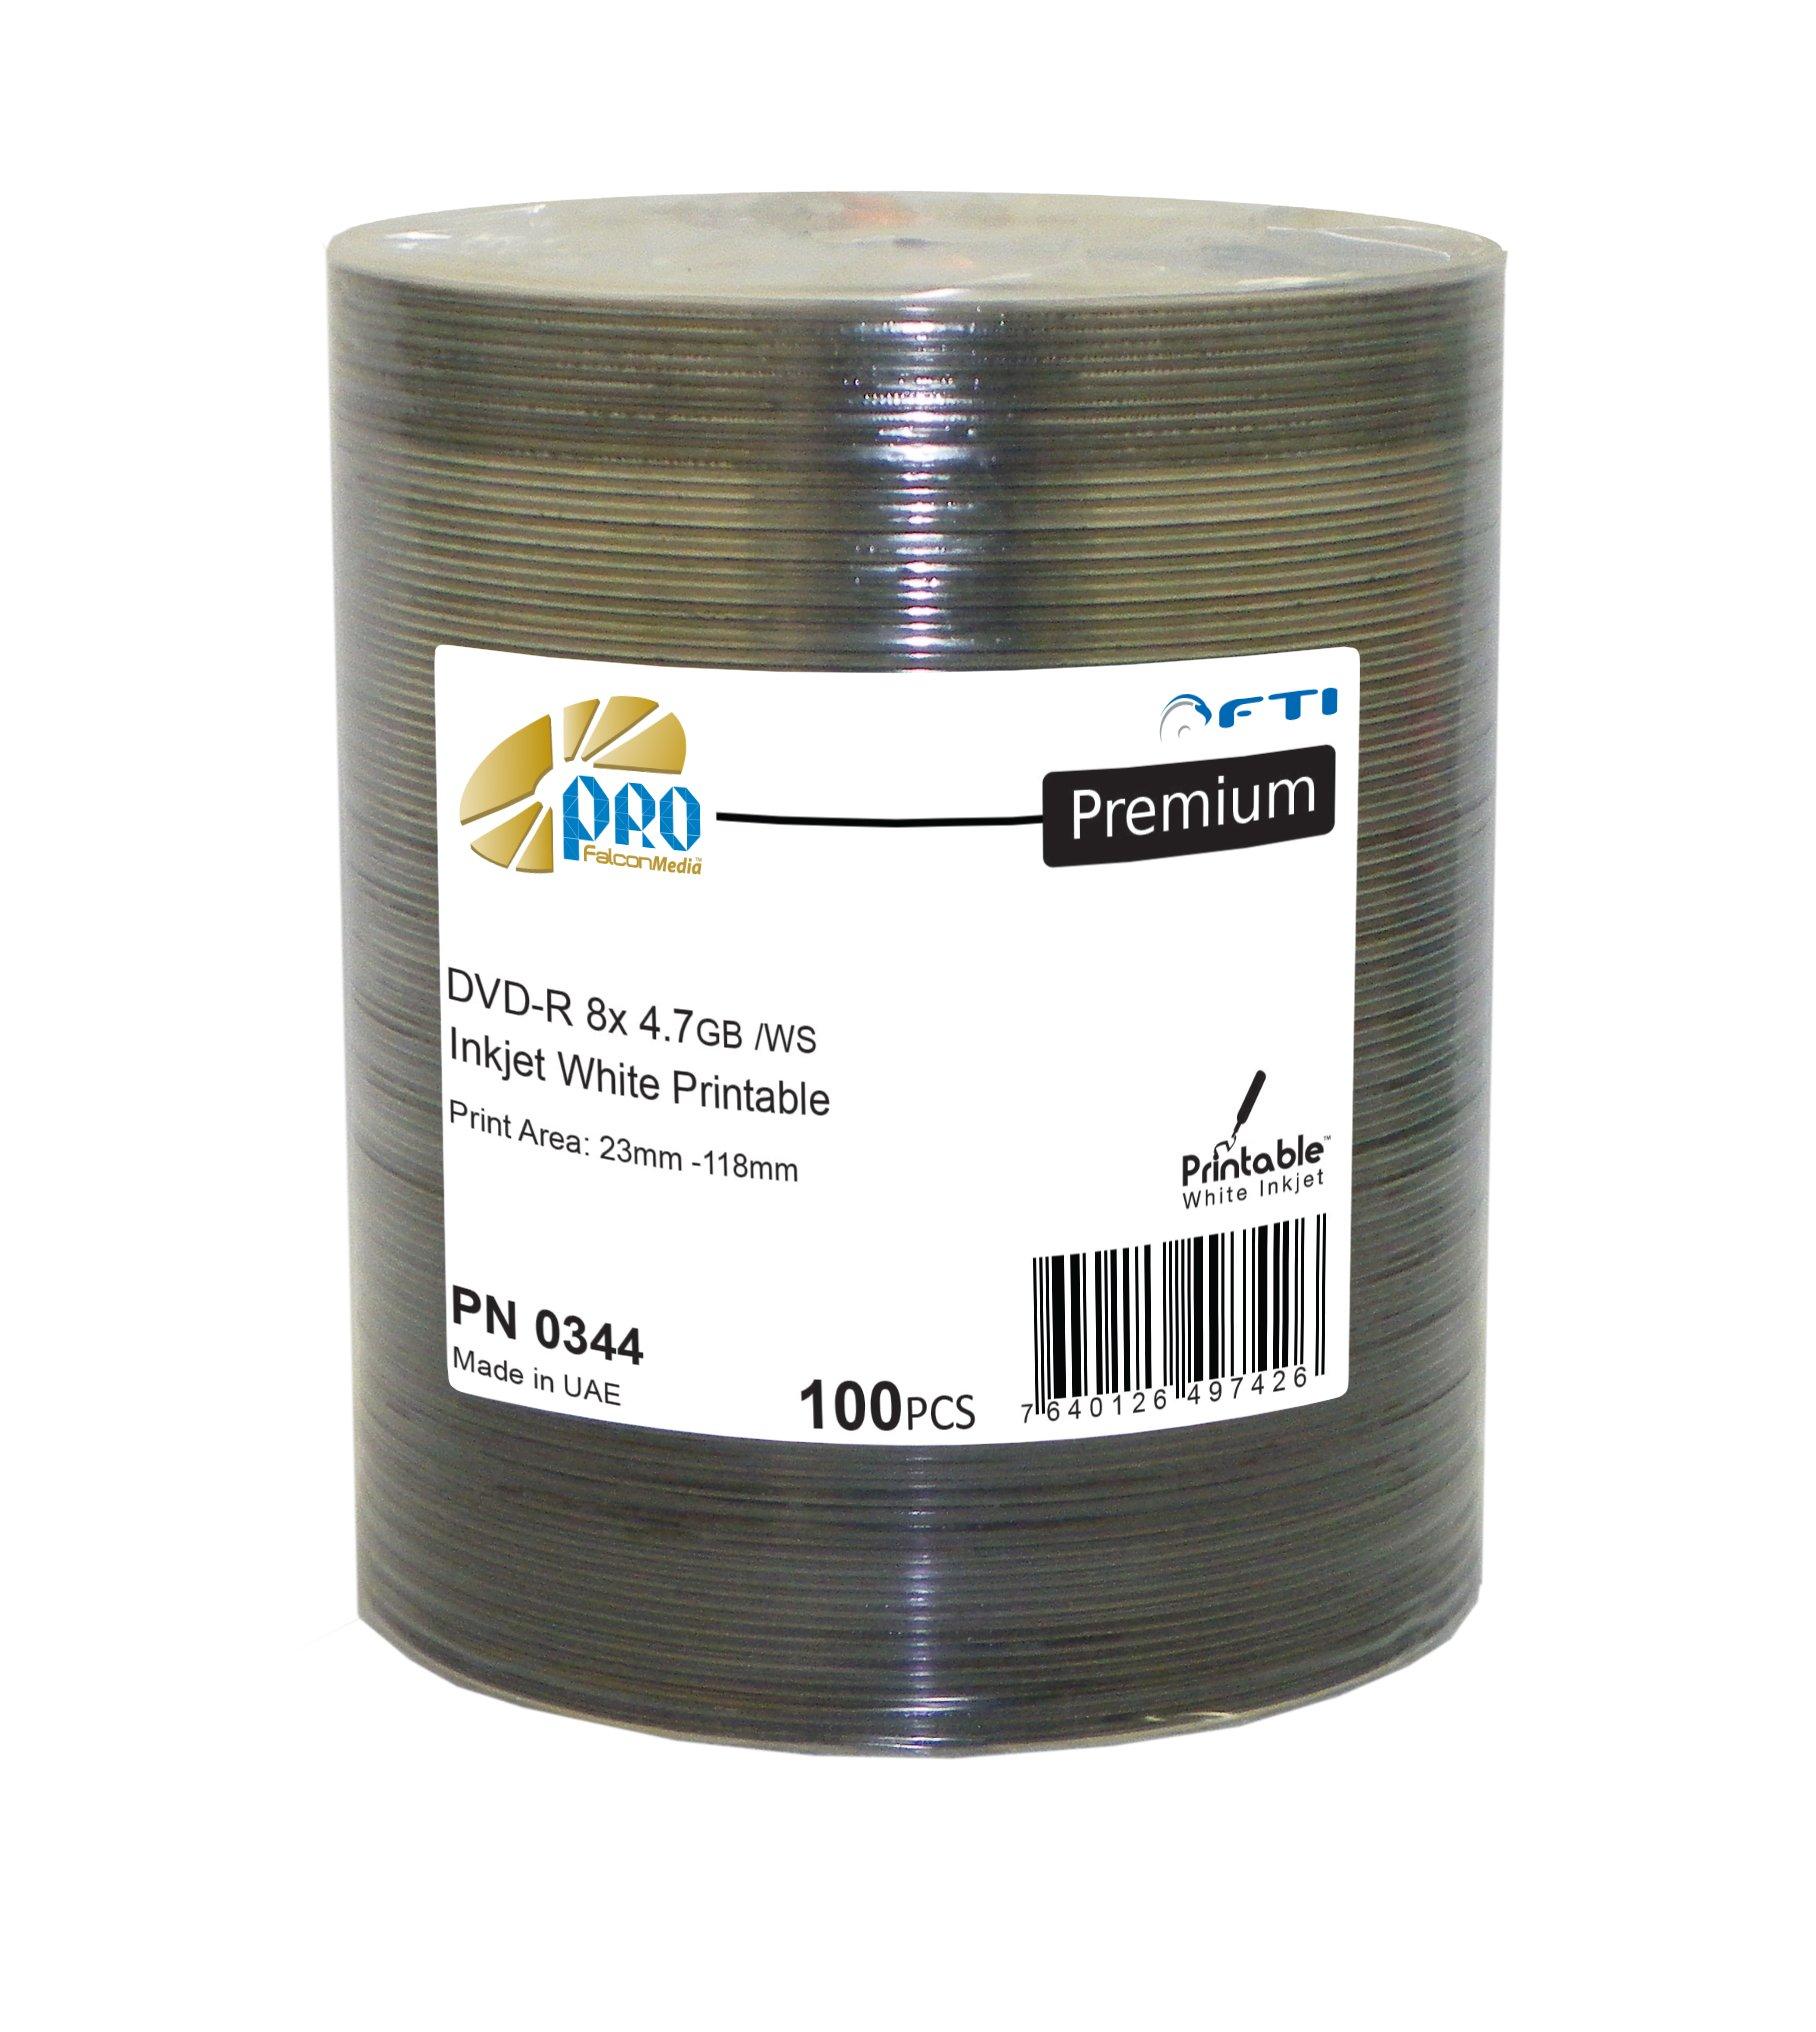 FalconMedia Premium Line DVD-R 8x 4.7GB Inkjet White Printable print area 23mm-118mm